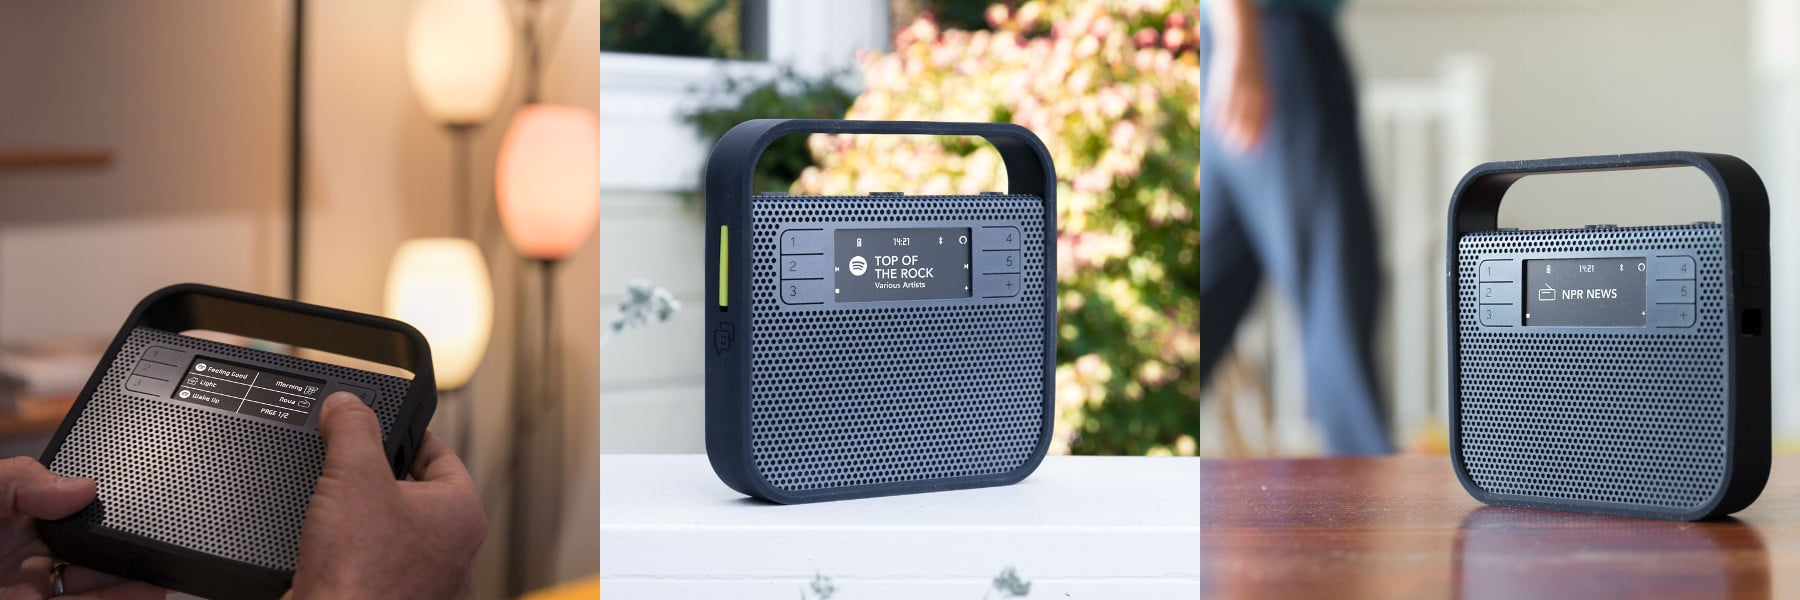 Invoxia Triby: Vielseitiger Lautsprecher mit HomeKit Integration